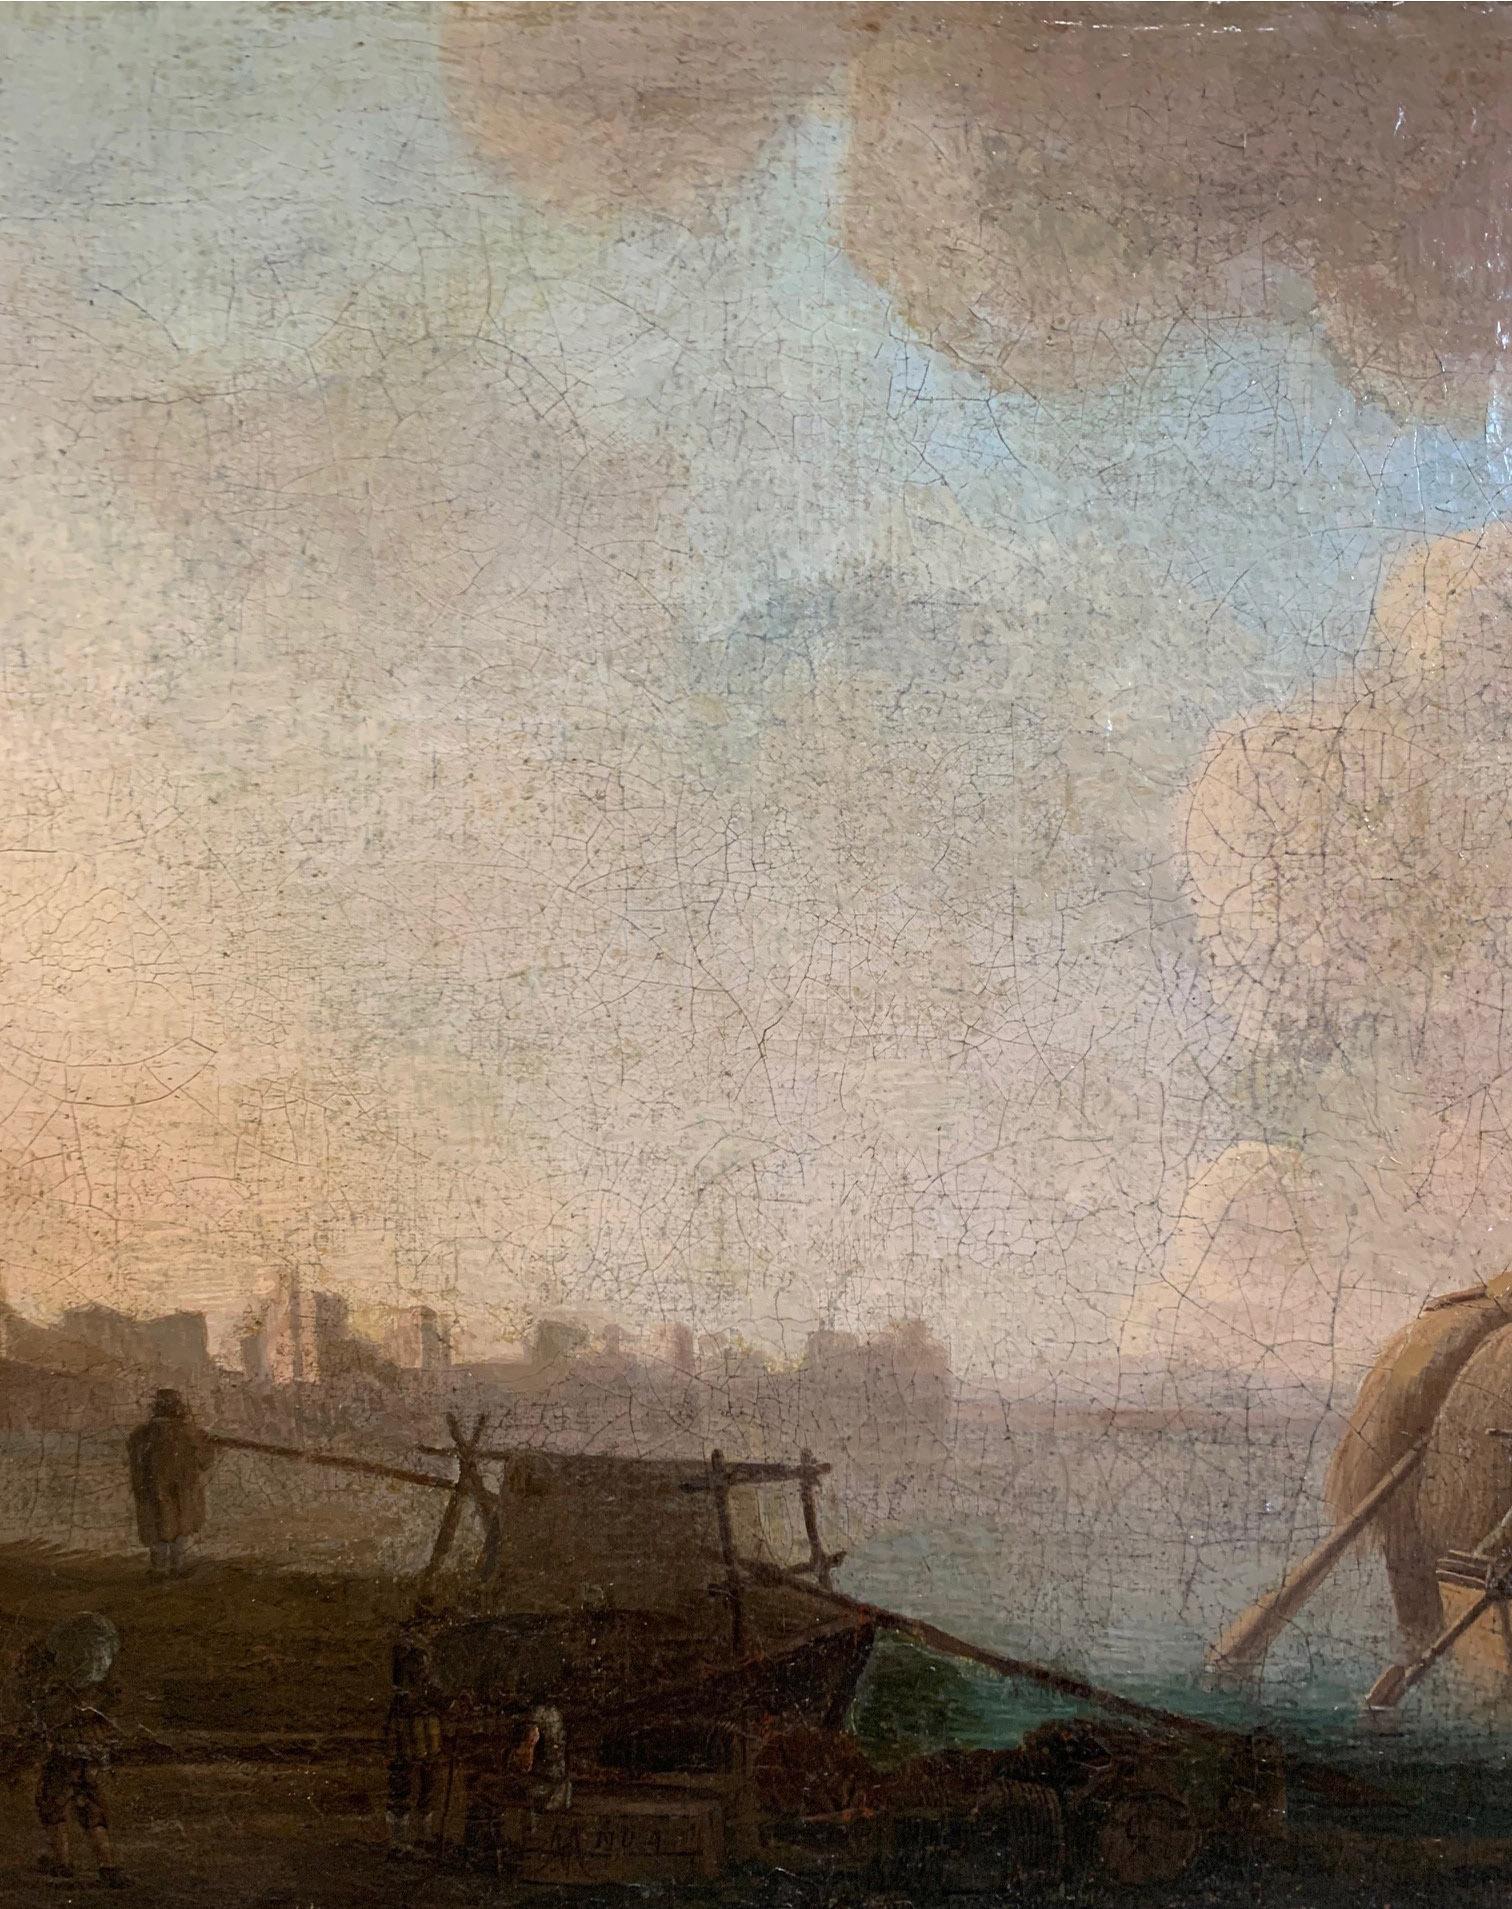 CIRCLE OF JAN VAN GOYEN, LEIDEN, 1596 - 1656, THE HAGUE, 17TH CENTURY OIL ON CANVAS River landscape, - Image 3 of 12